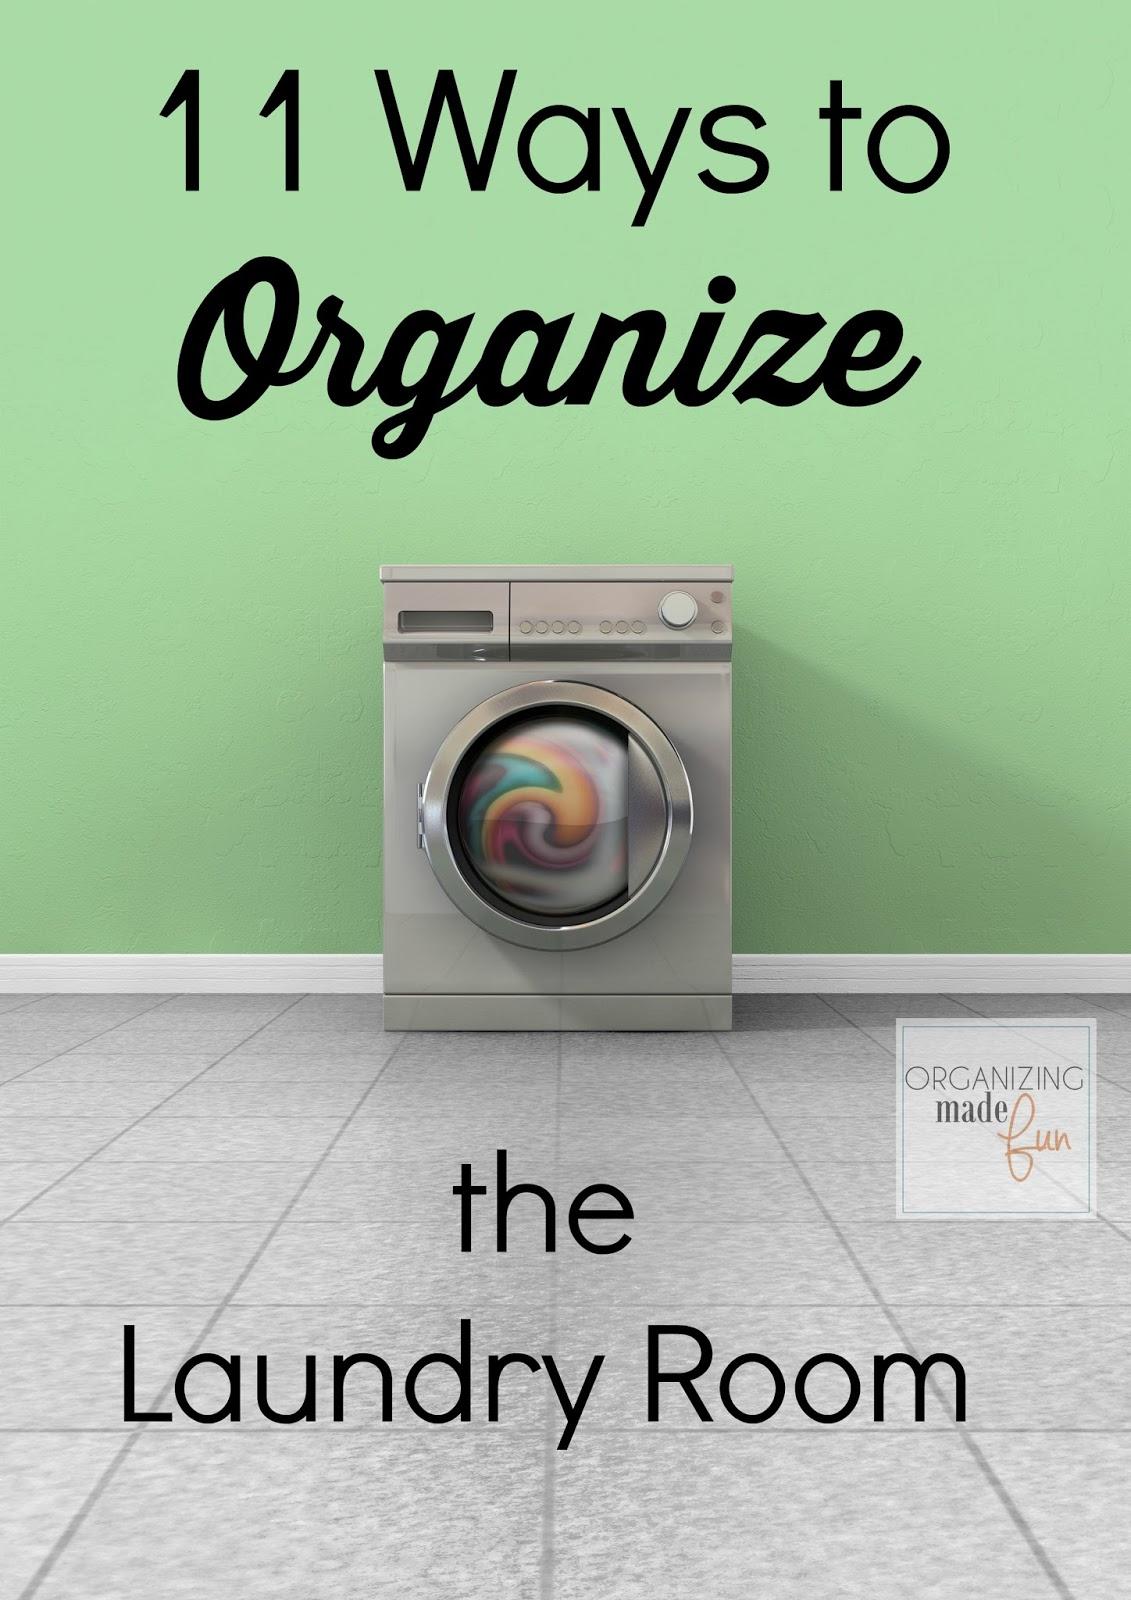 11 Ways to Organize the Laundry Room   Organizing Made Fun: 11 Ways ...